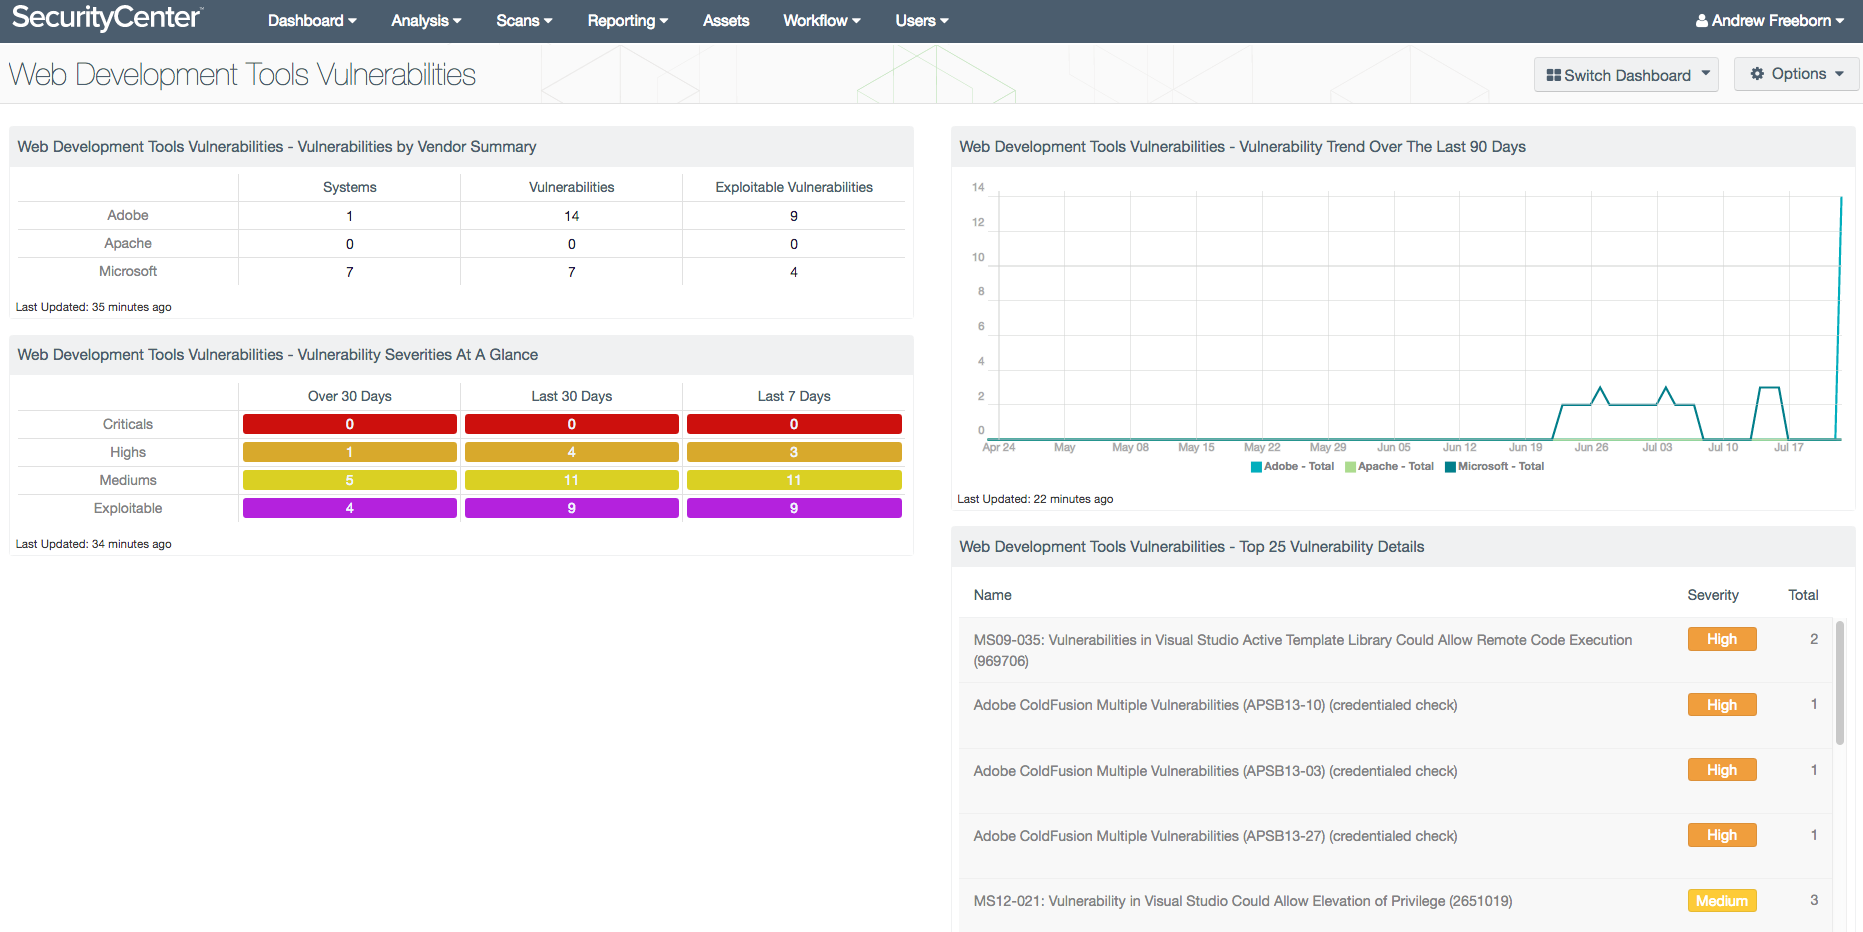 Web Development Tools Vulnerabilities - SC Dashboard | Tenable®